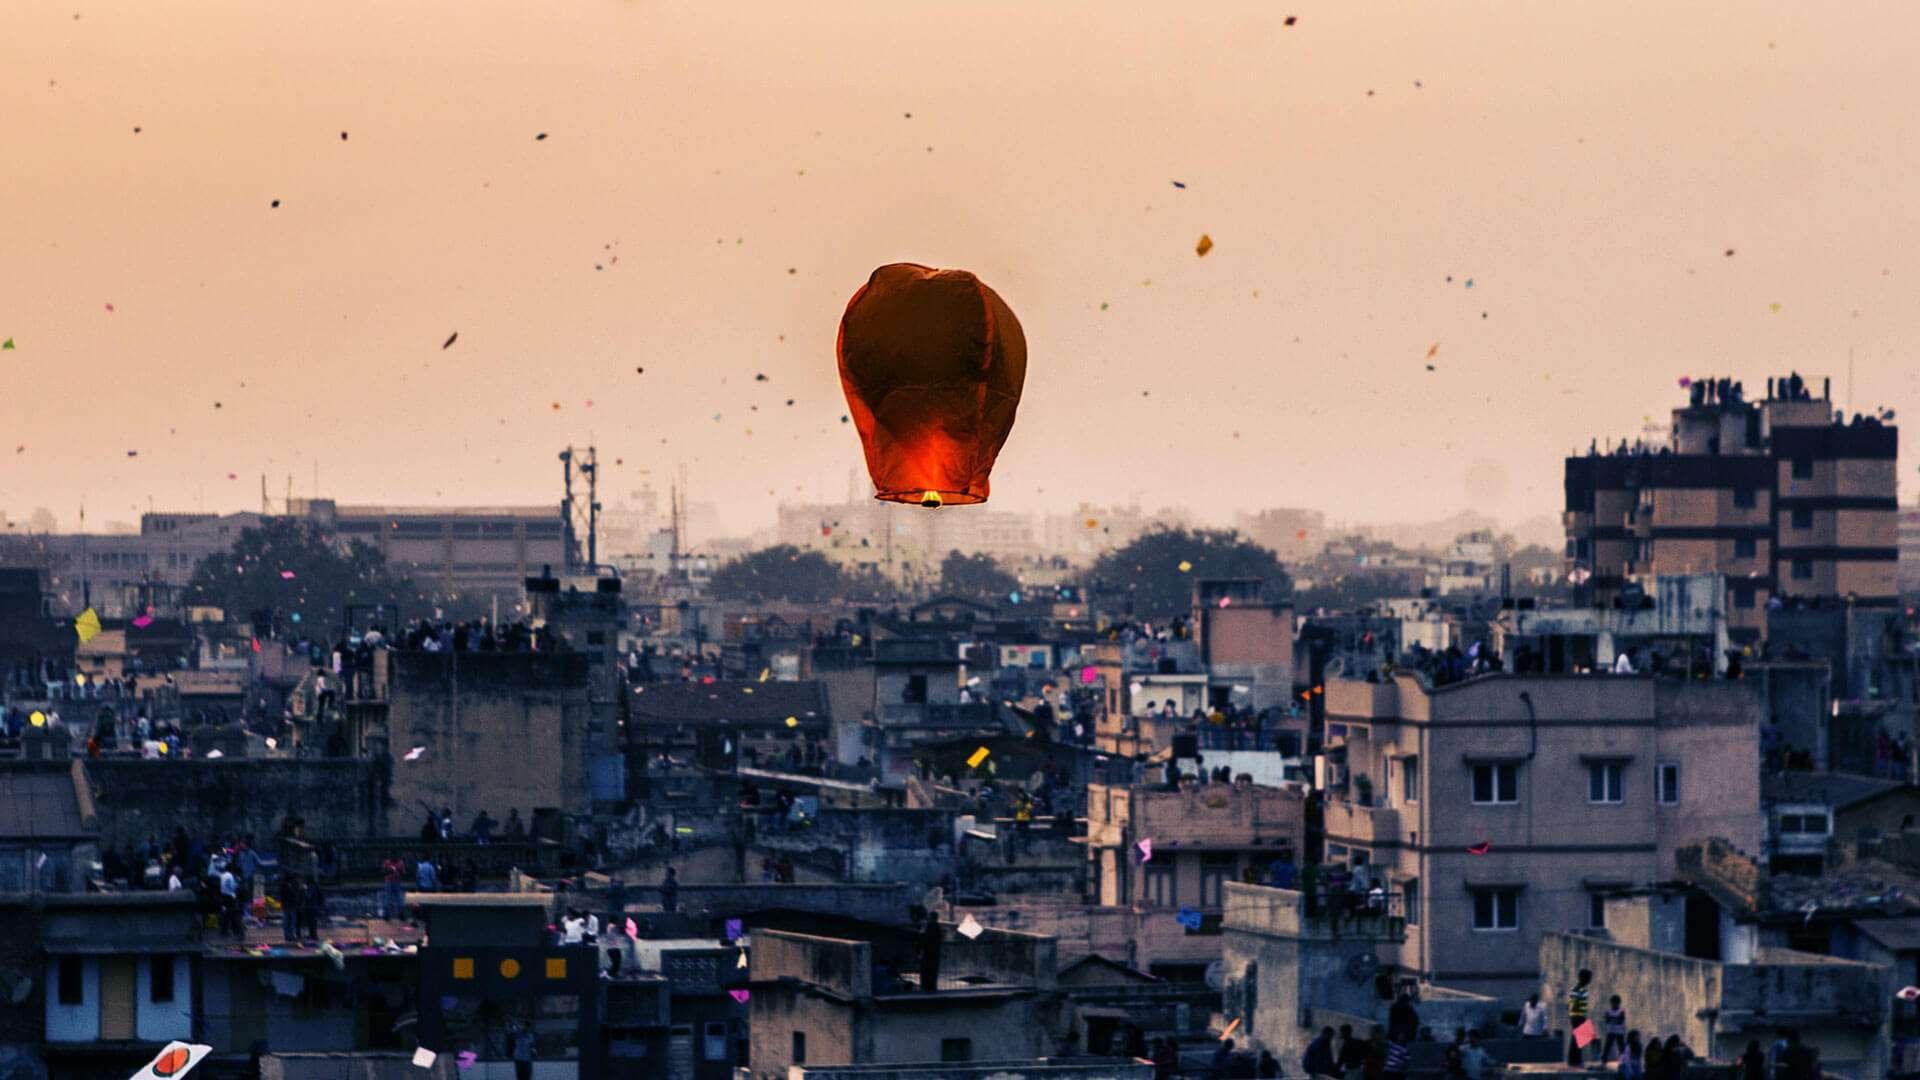 International_Kite_Festival_Attractions